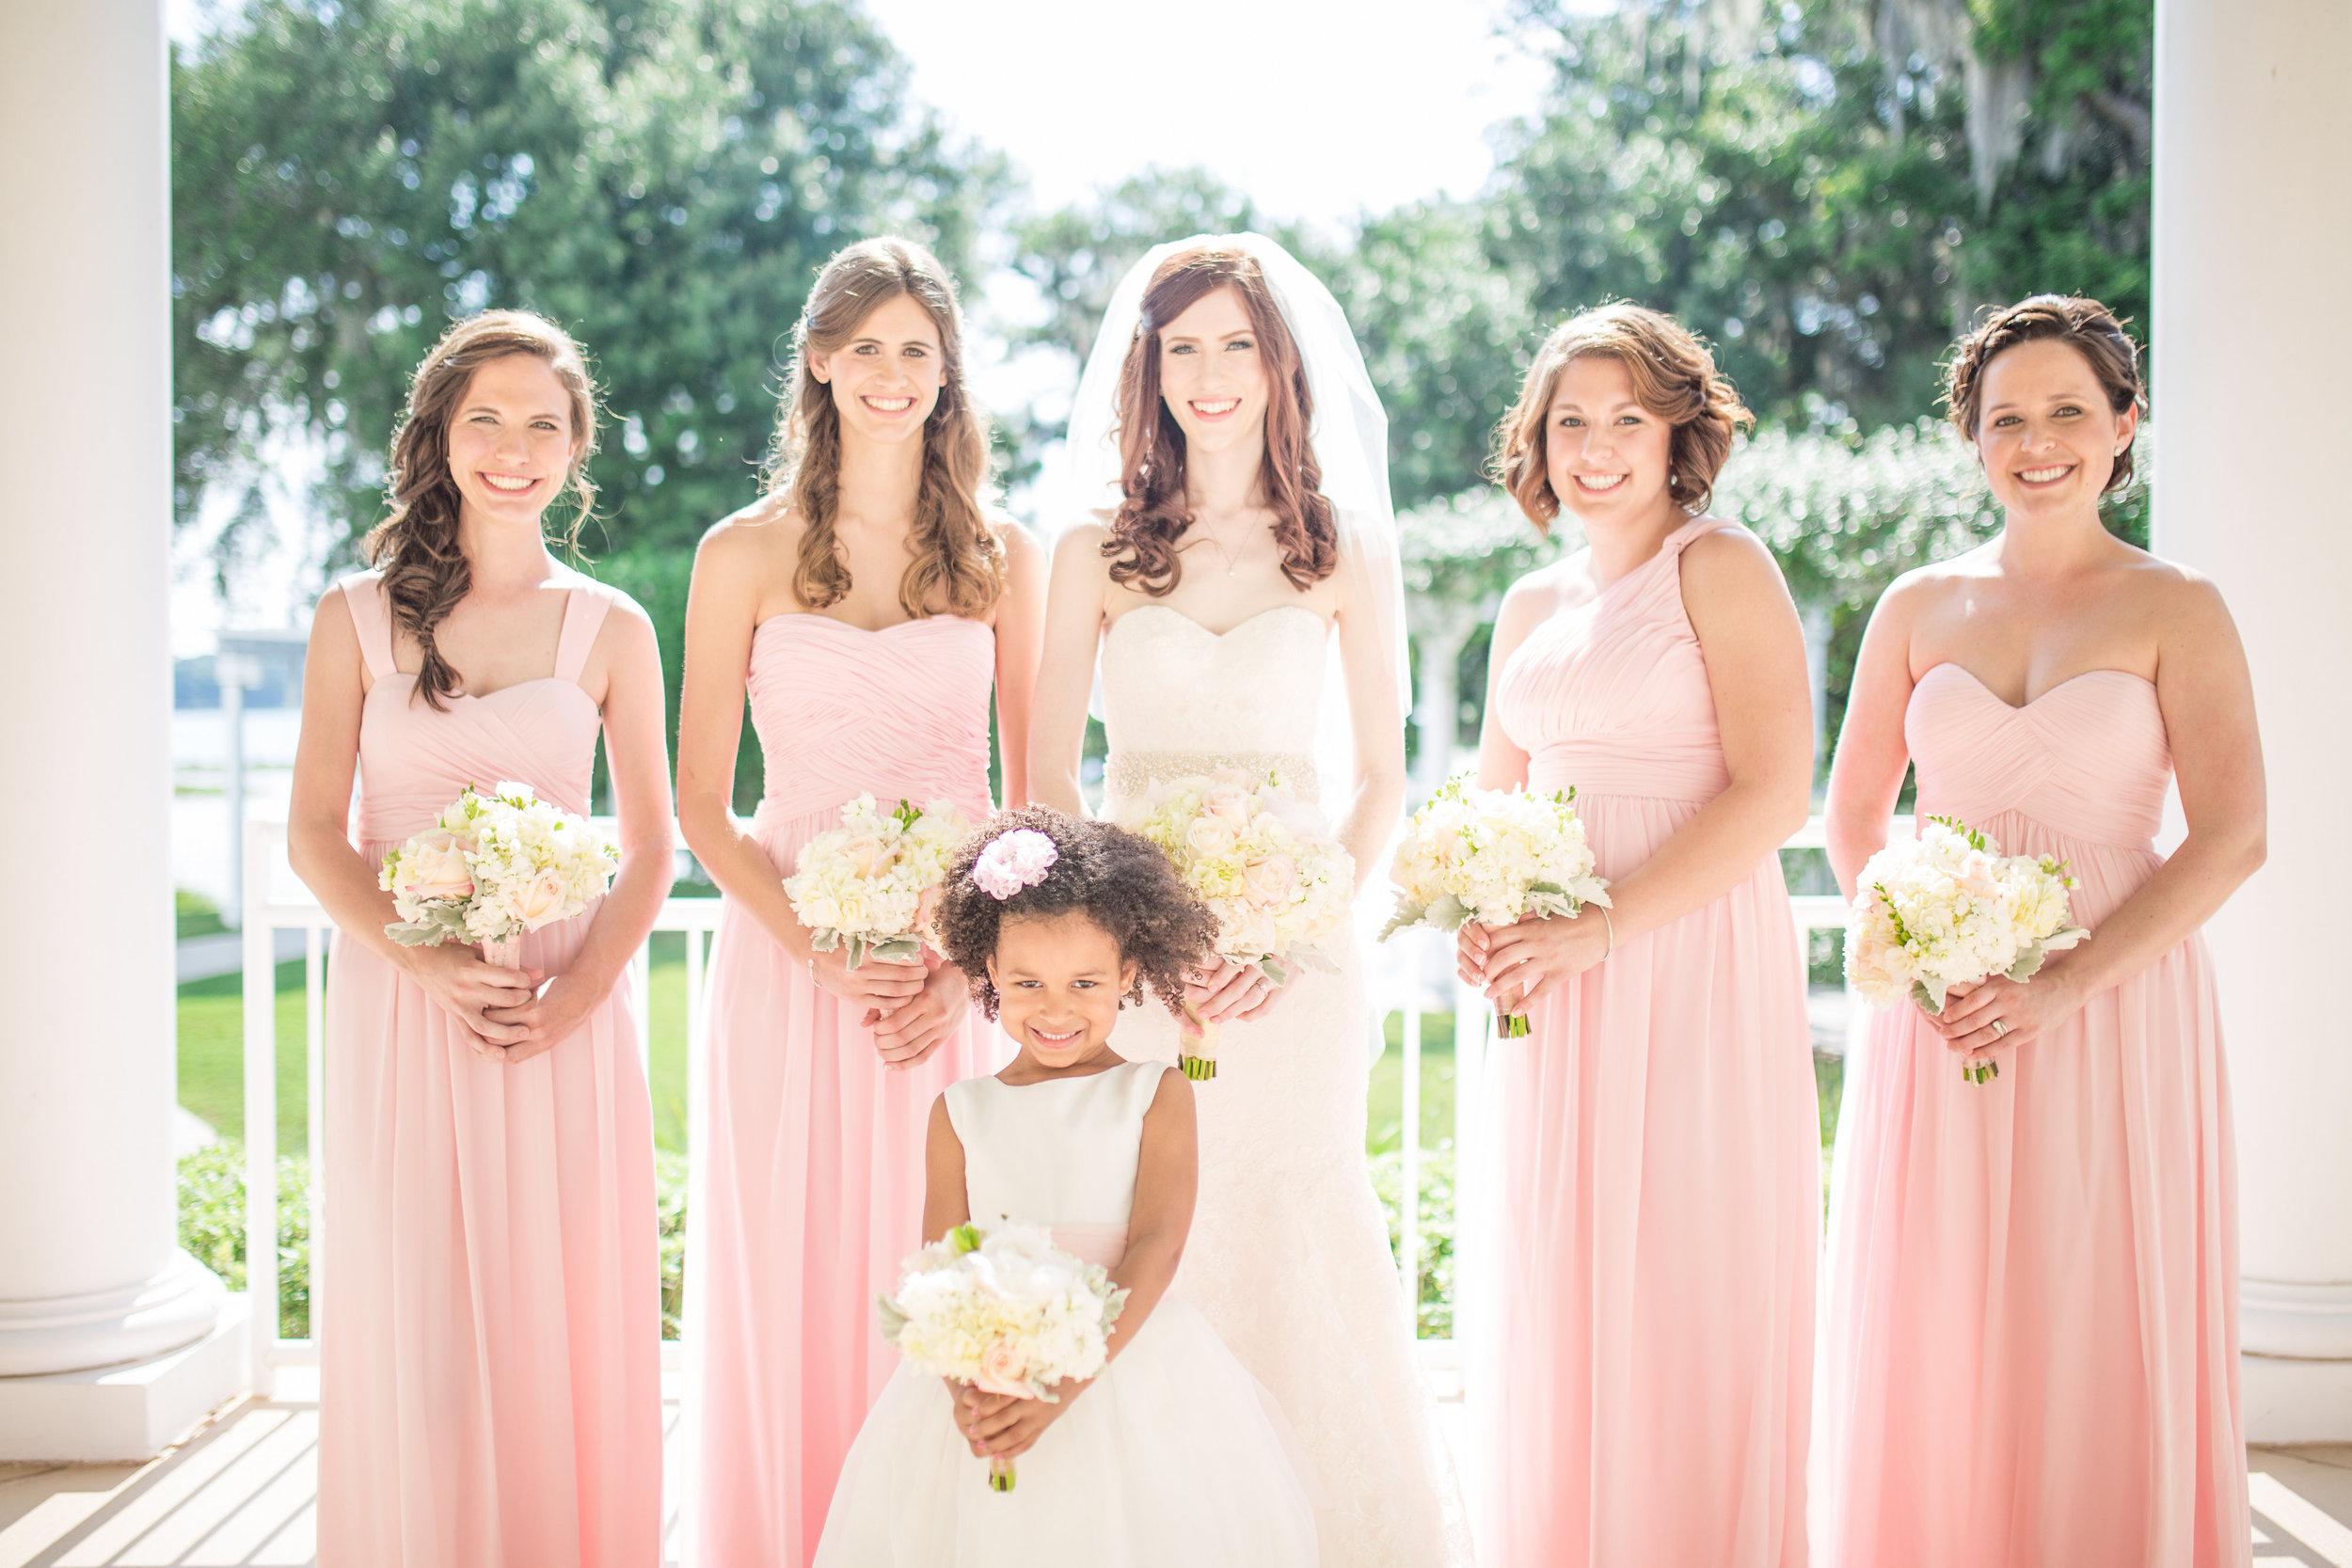 Stockbridge Wedding-Stockbridge Wedding 2015 JPEG-0180.jpg